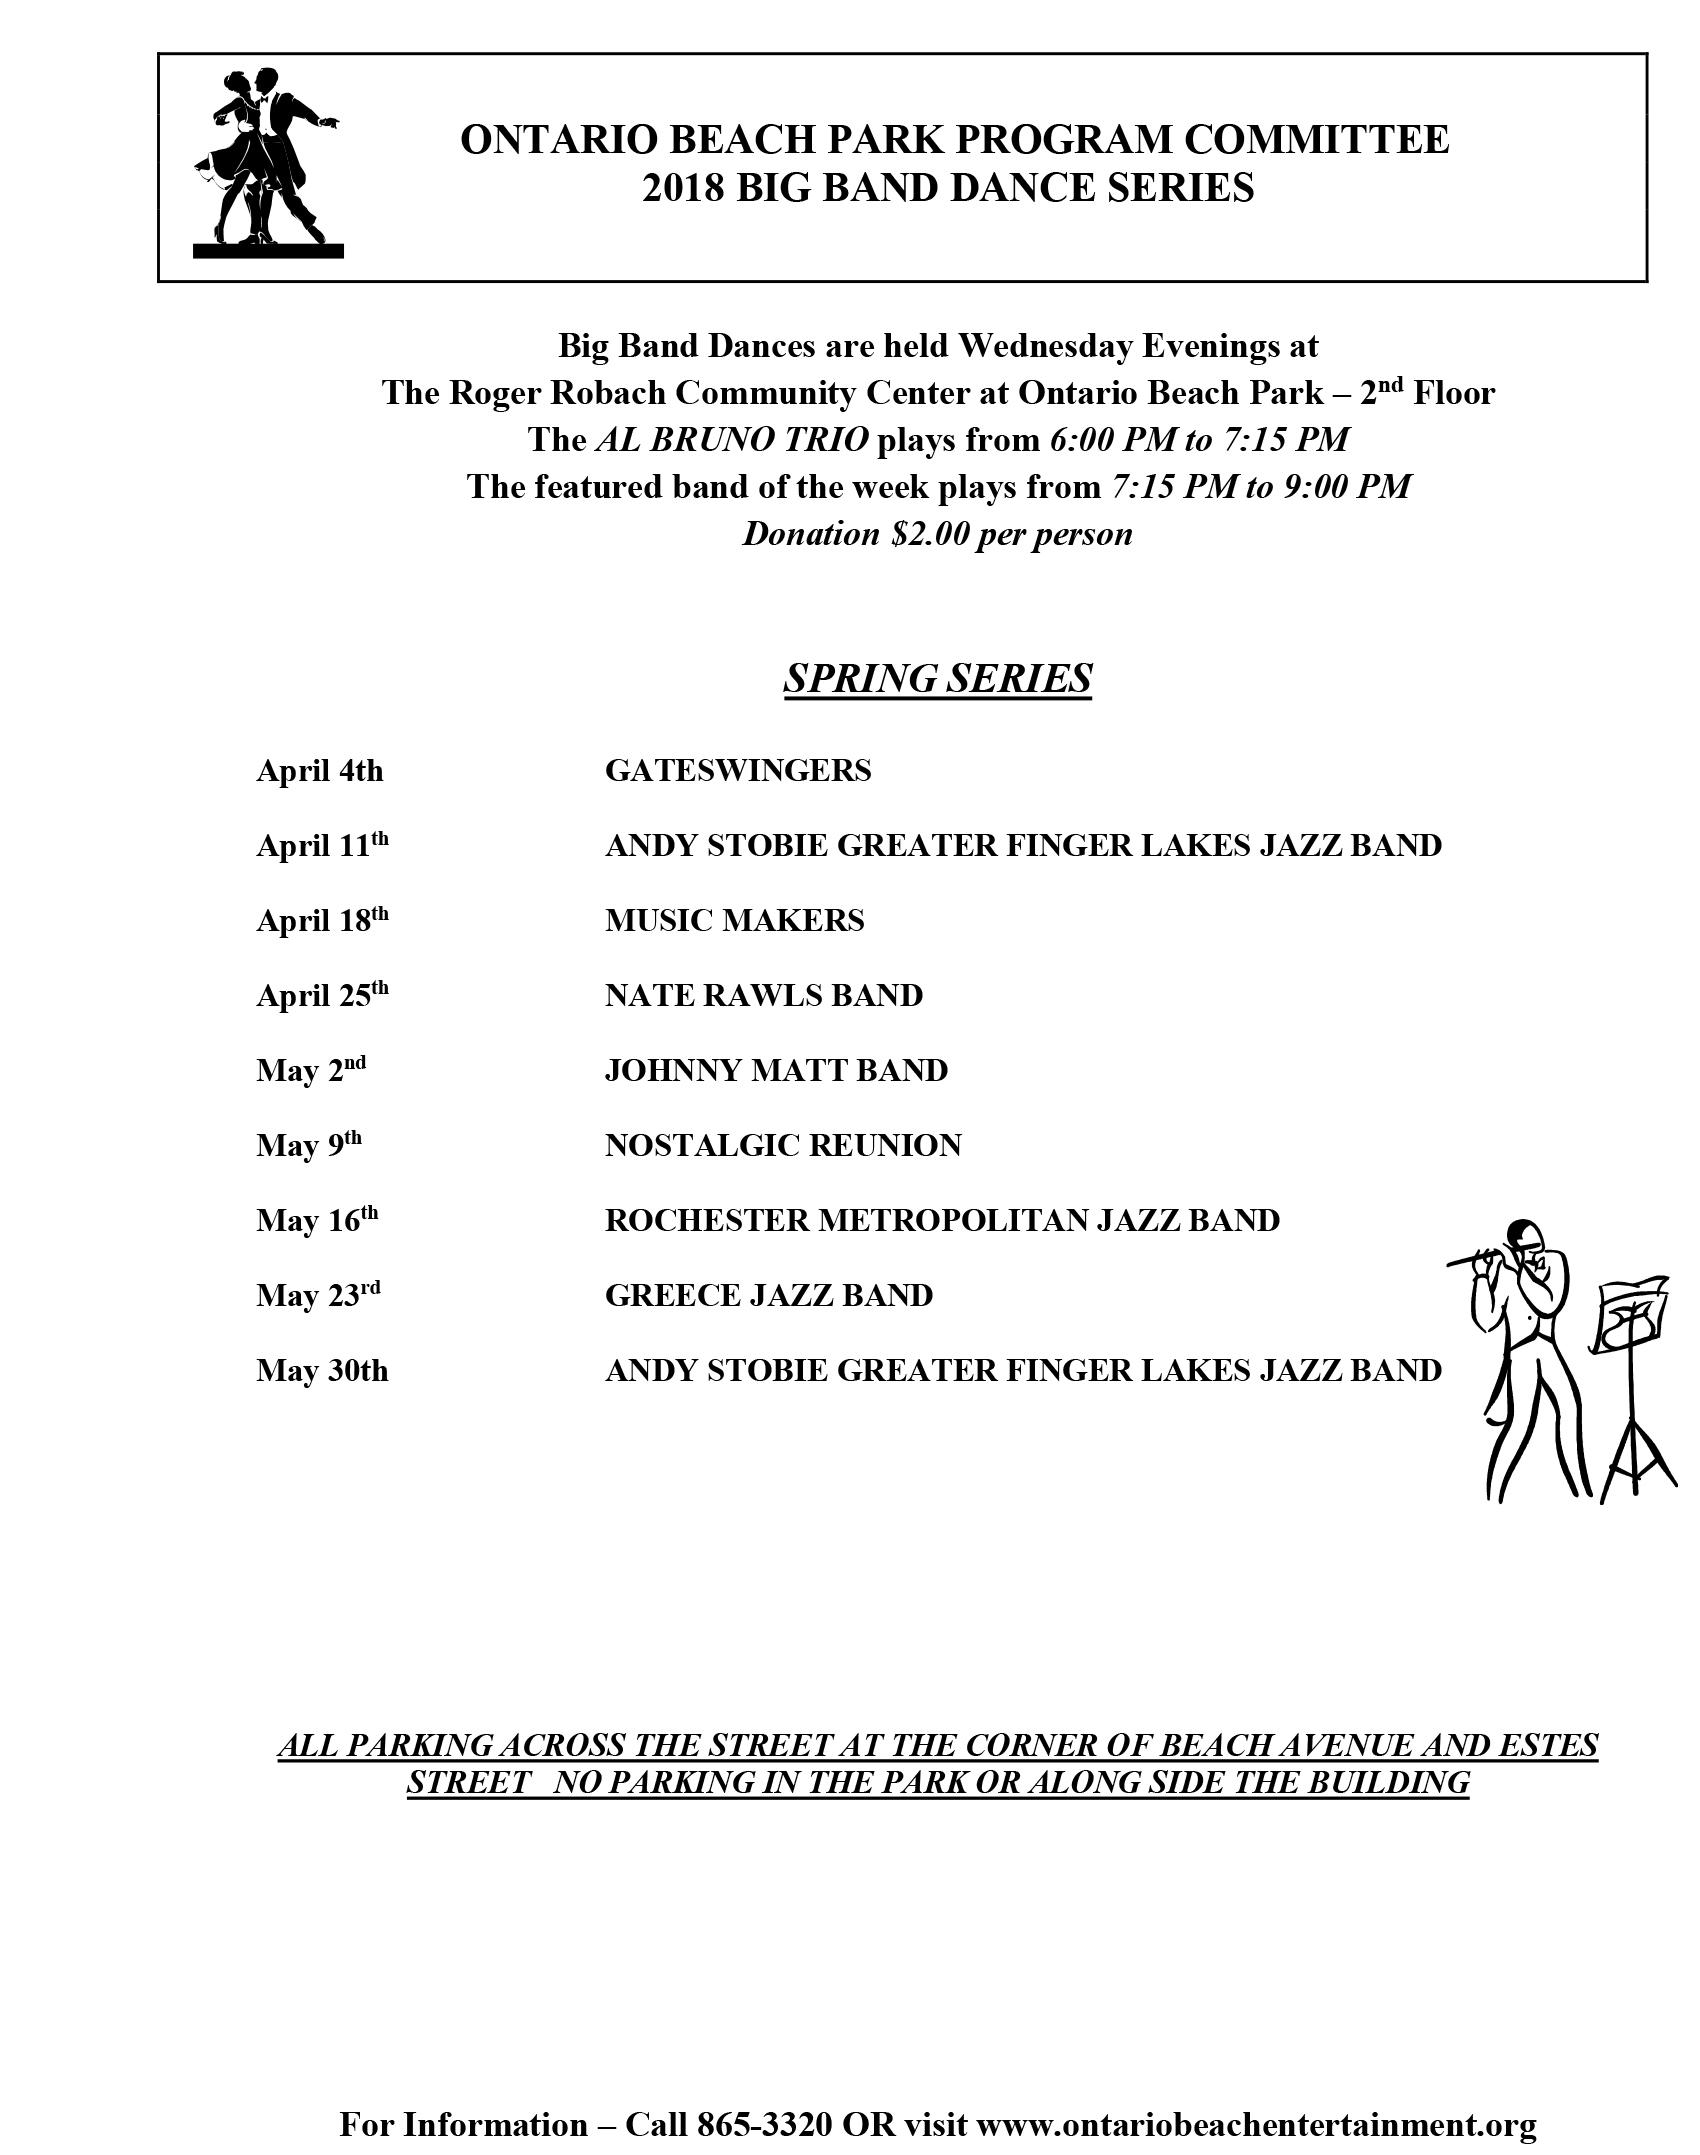 Spring 2018 Big Band Schedule